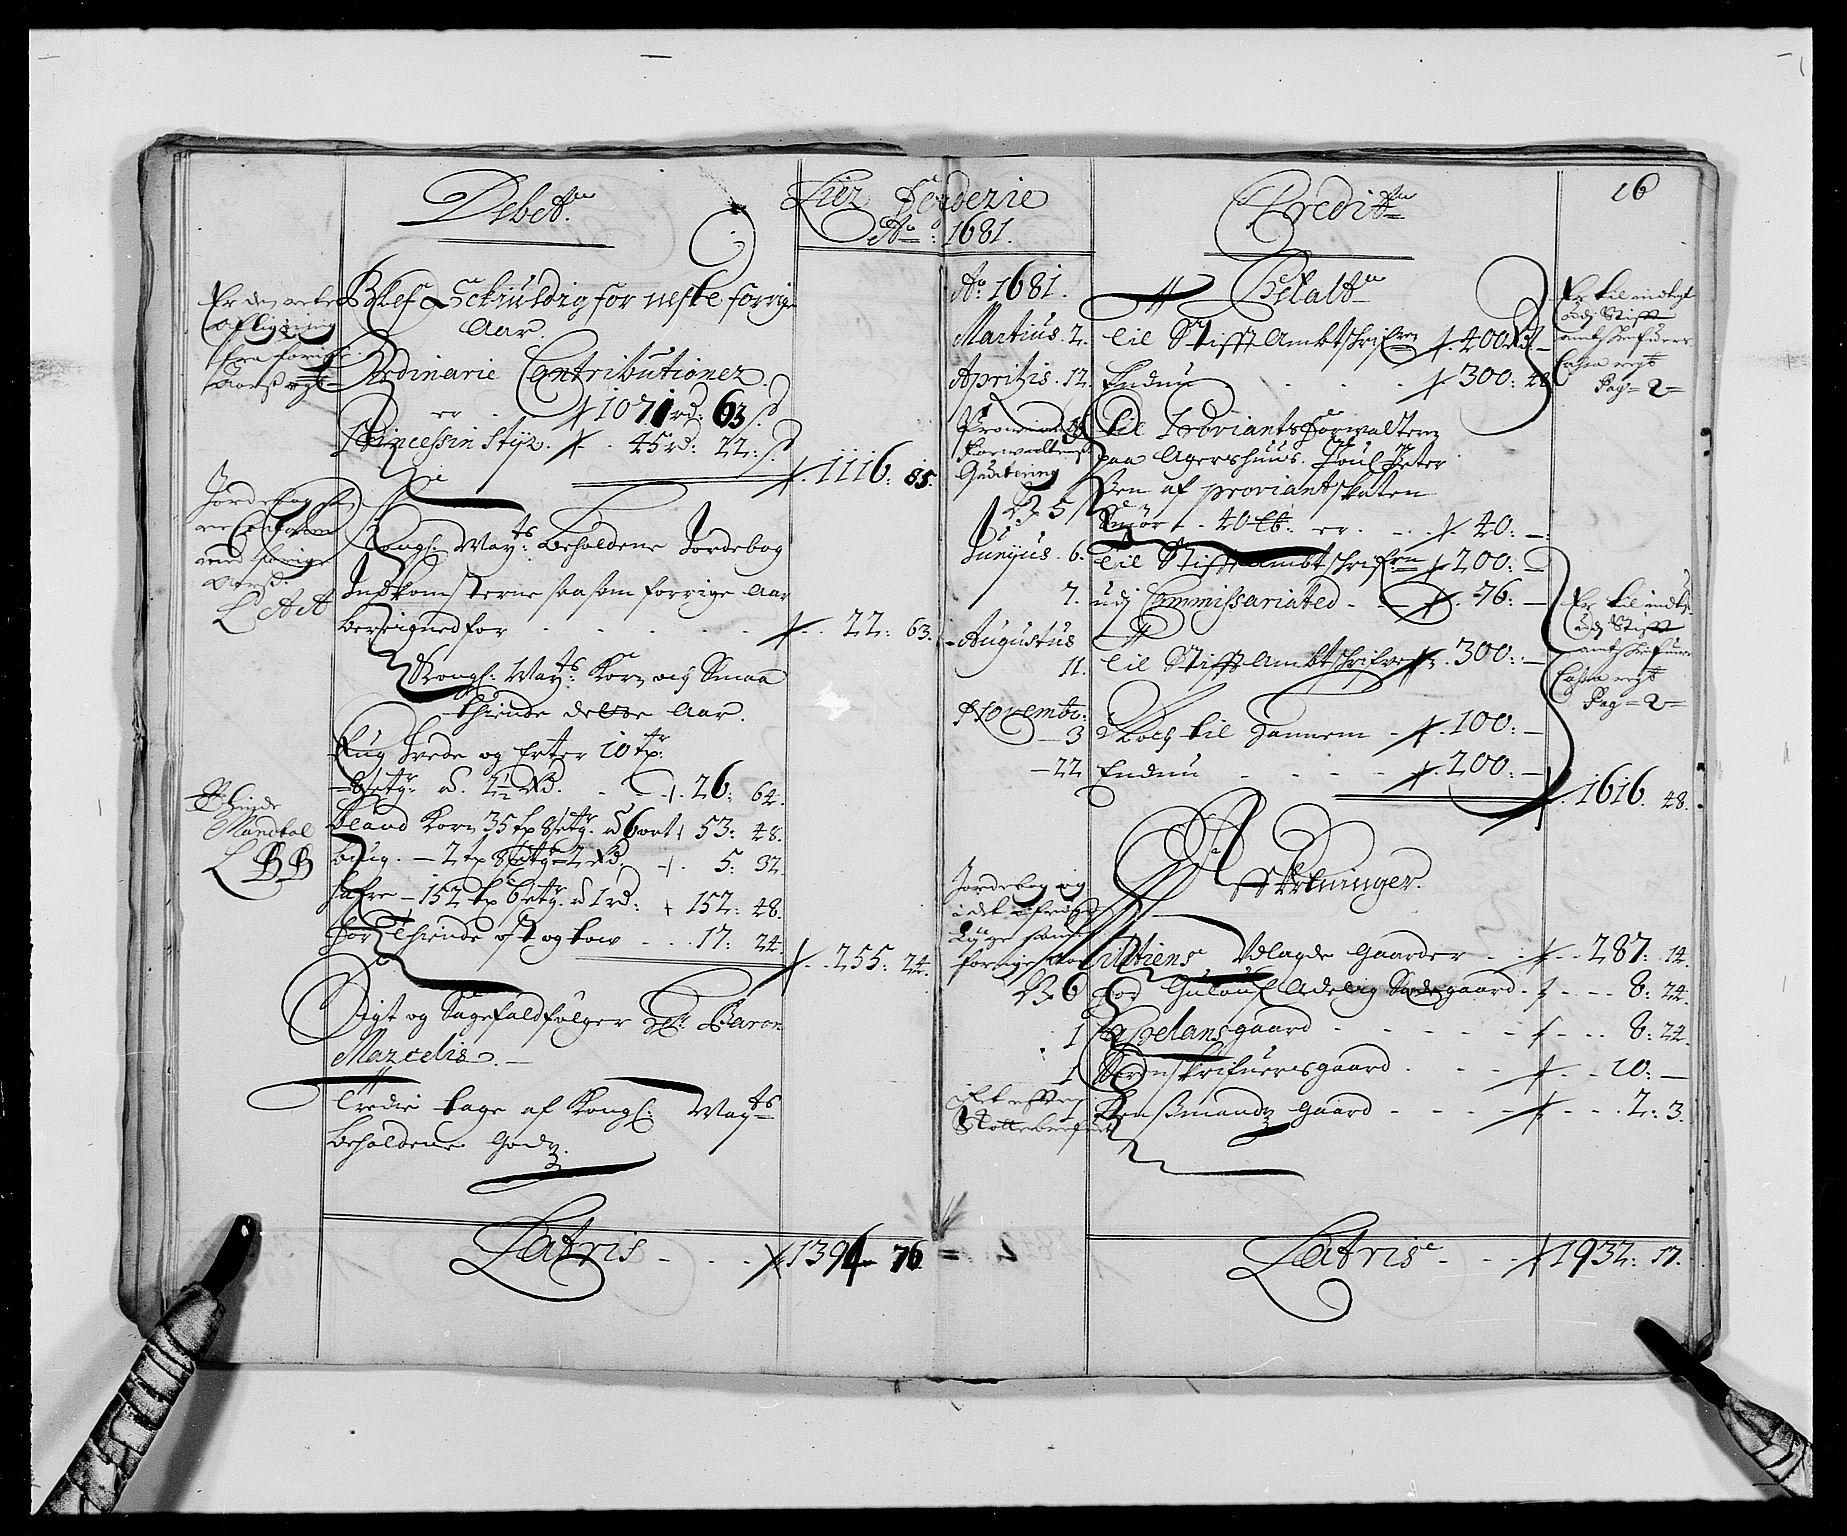 RA, Rentekammeret inntil 1814, Reviderte regnskaper, Fogderegnskap, R27/L1686: Fogderegnskap Lier, 1678-1686, s. 19